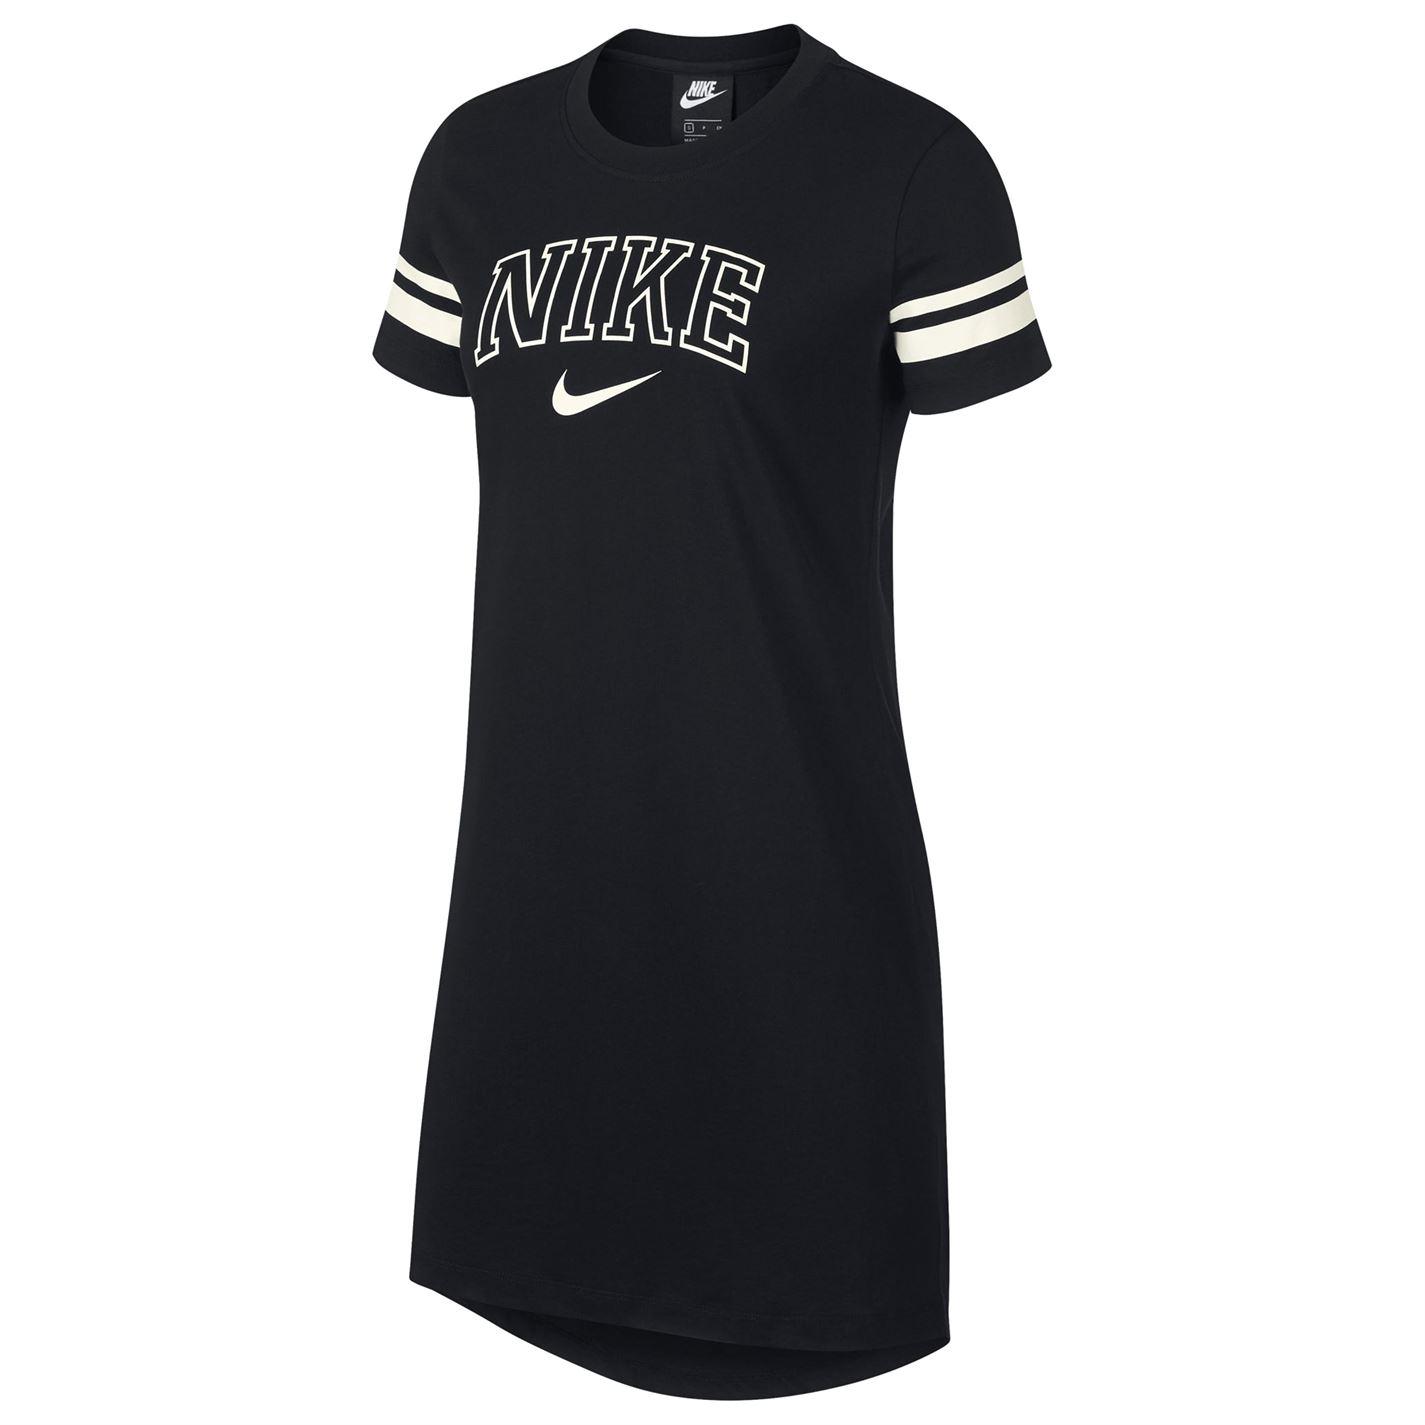 Nike Varsity Dress Ladies